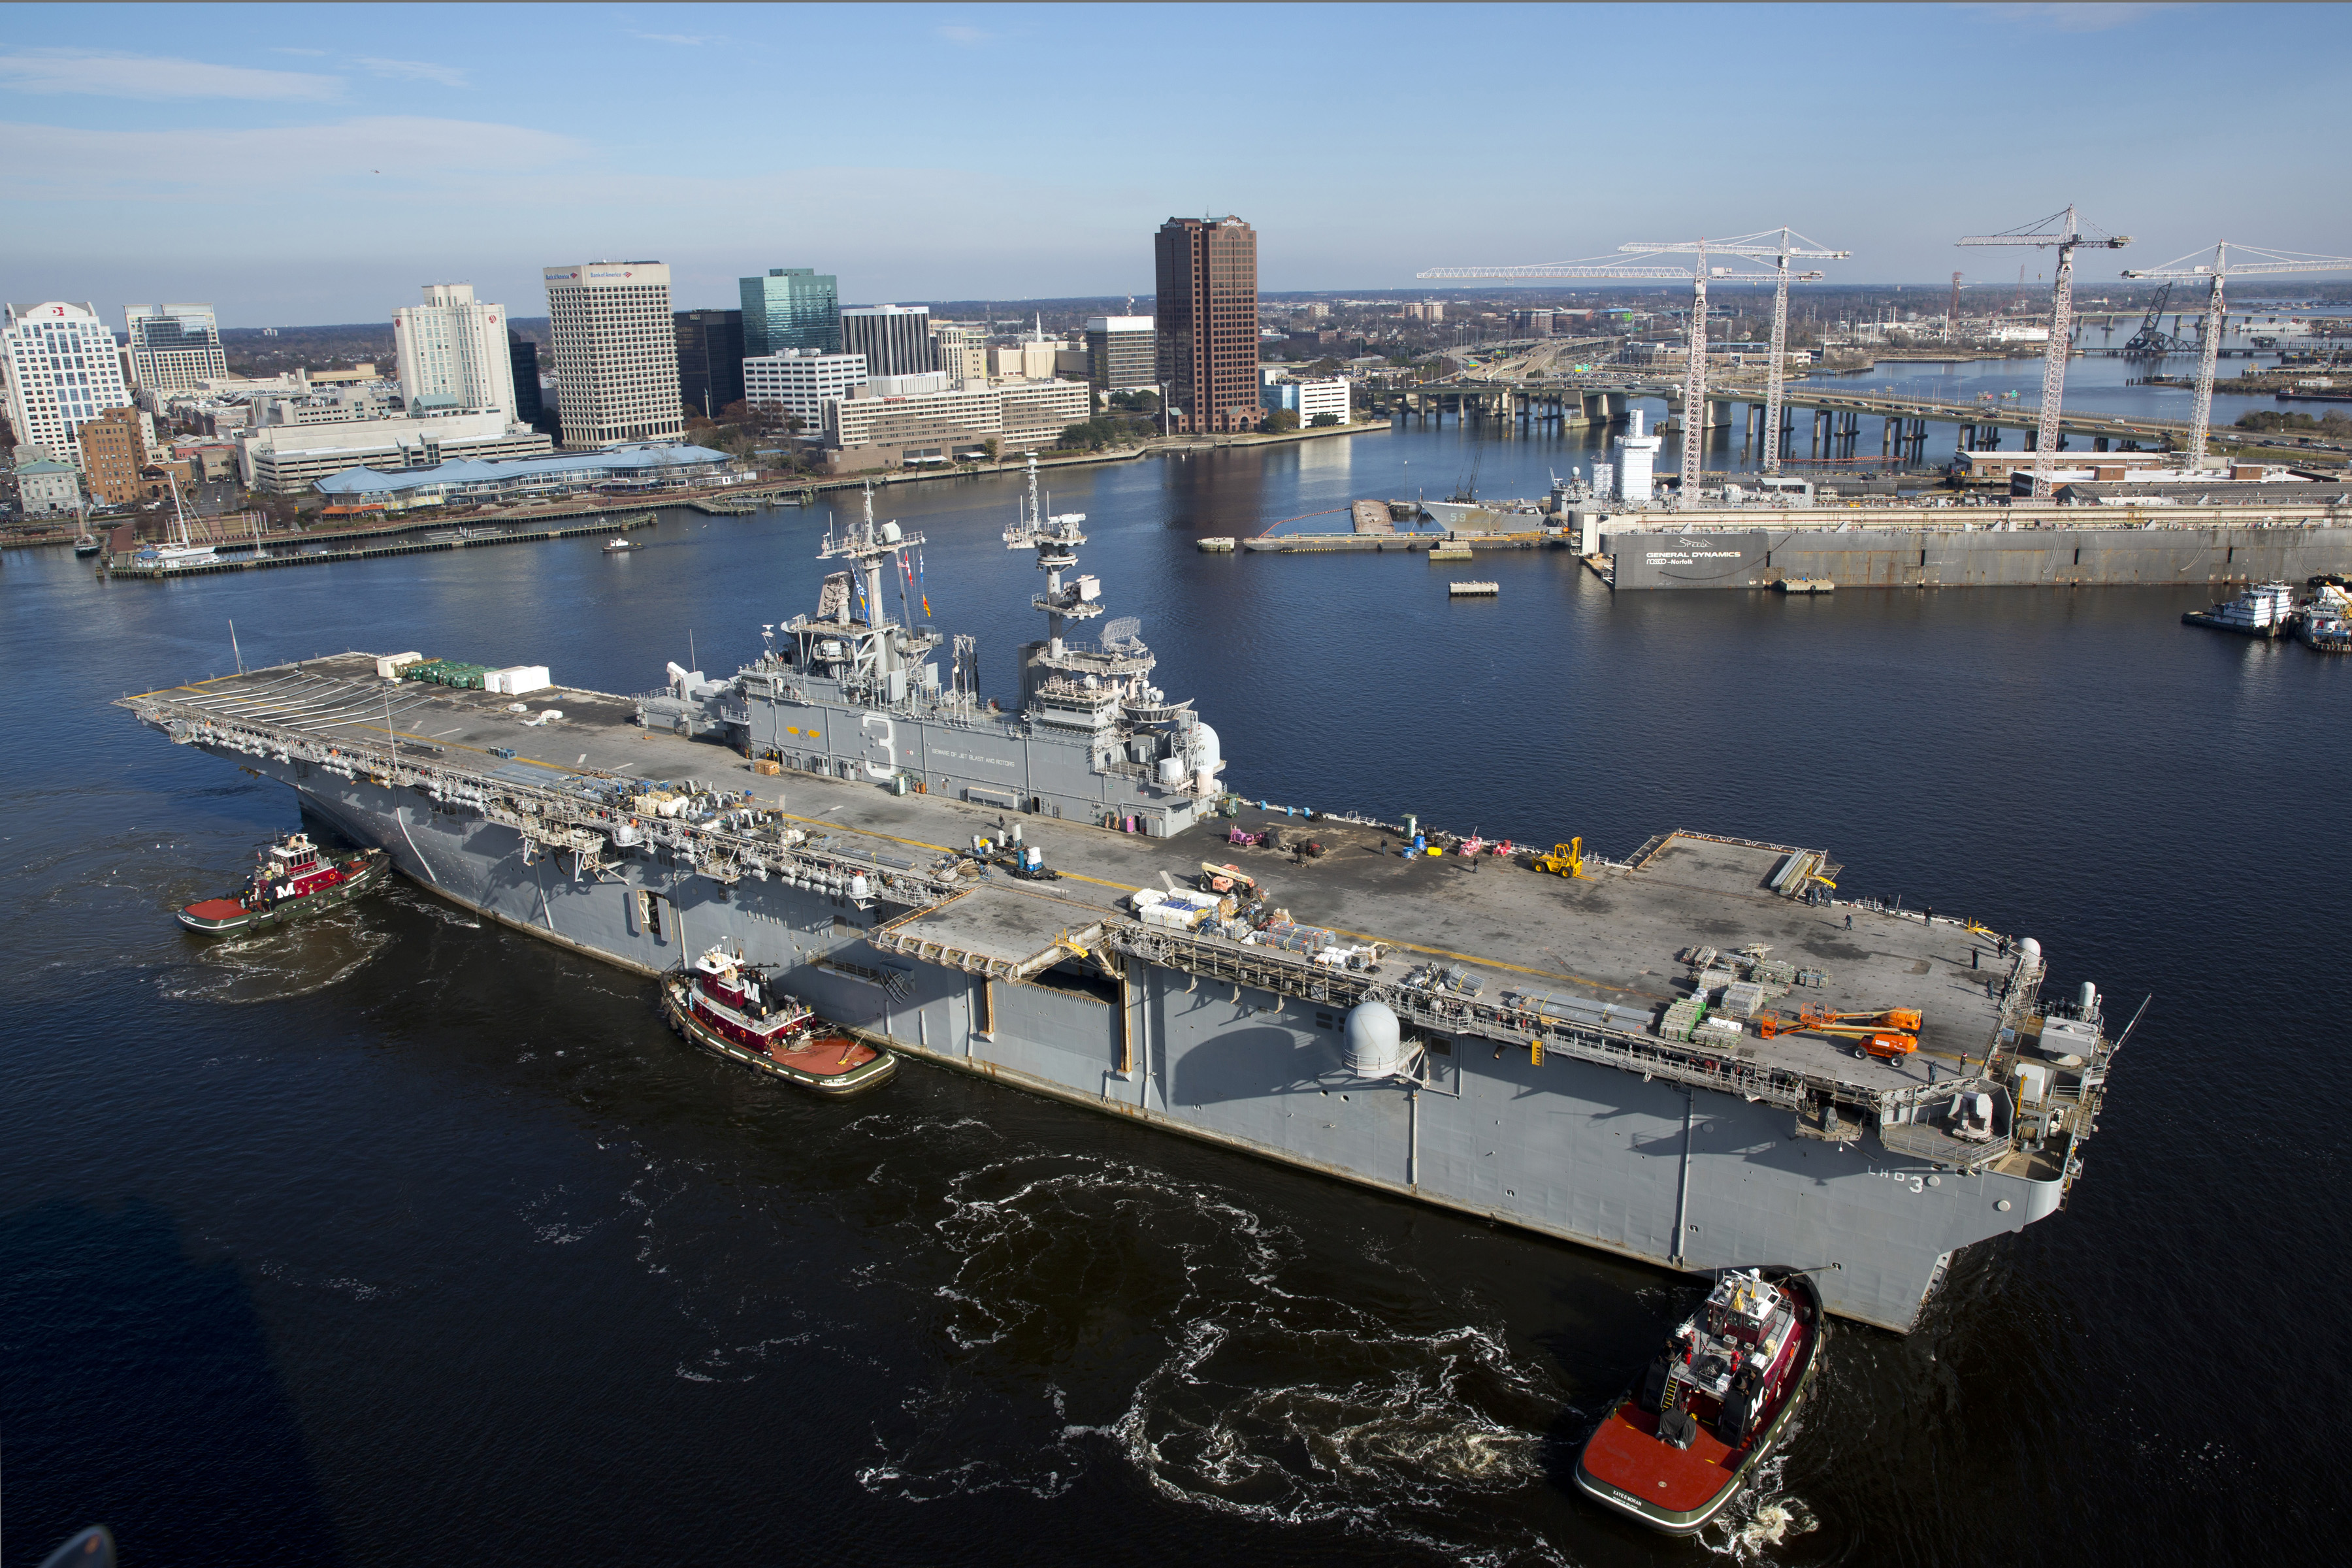 USS KEARSARGE LHD-3 am 16.12.2013 Bild: U.S. Navy